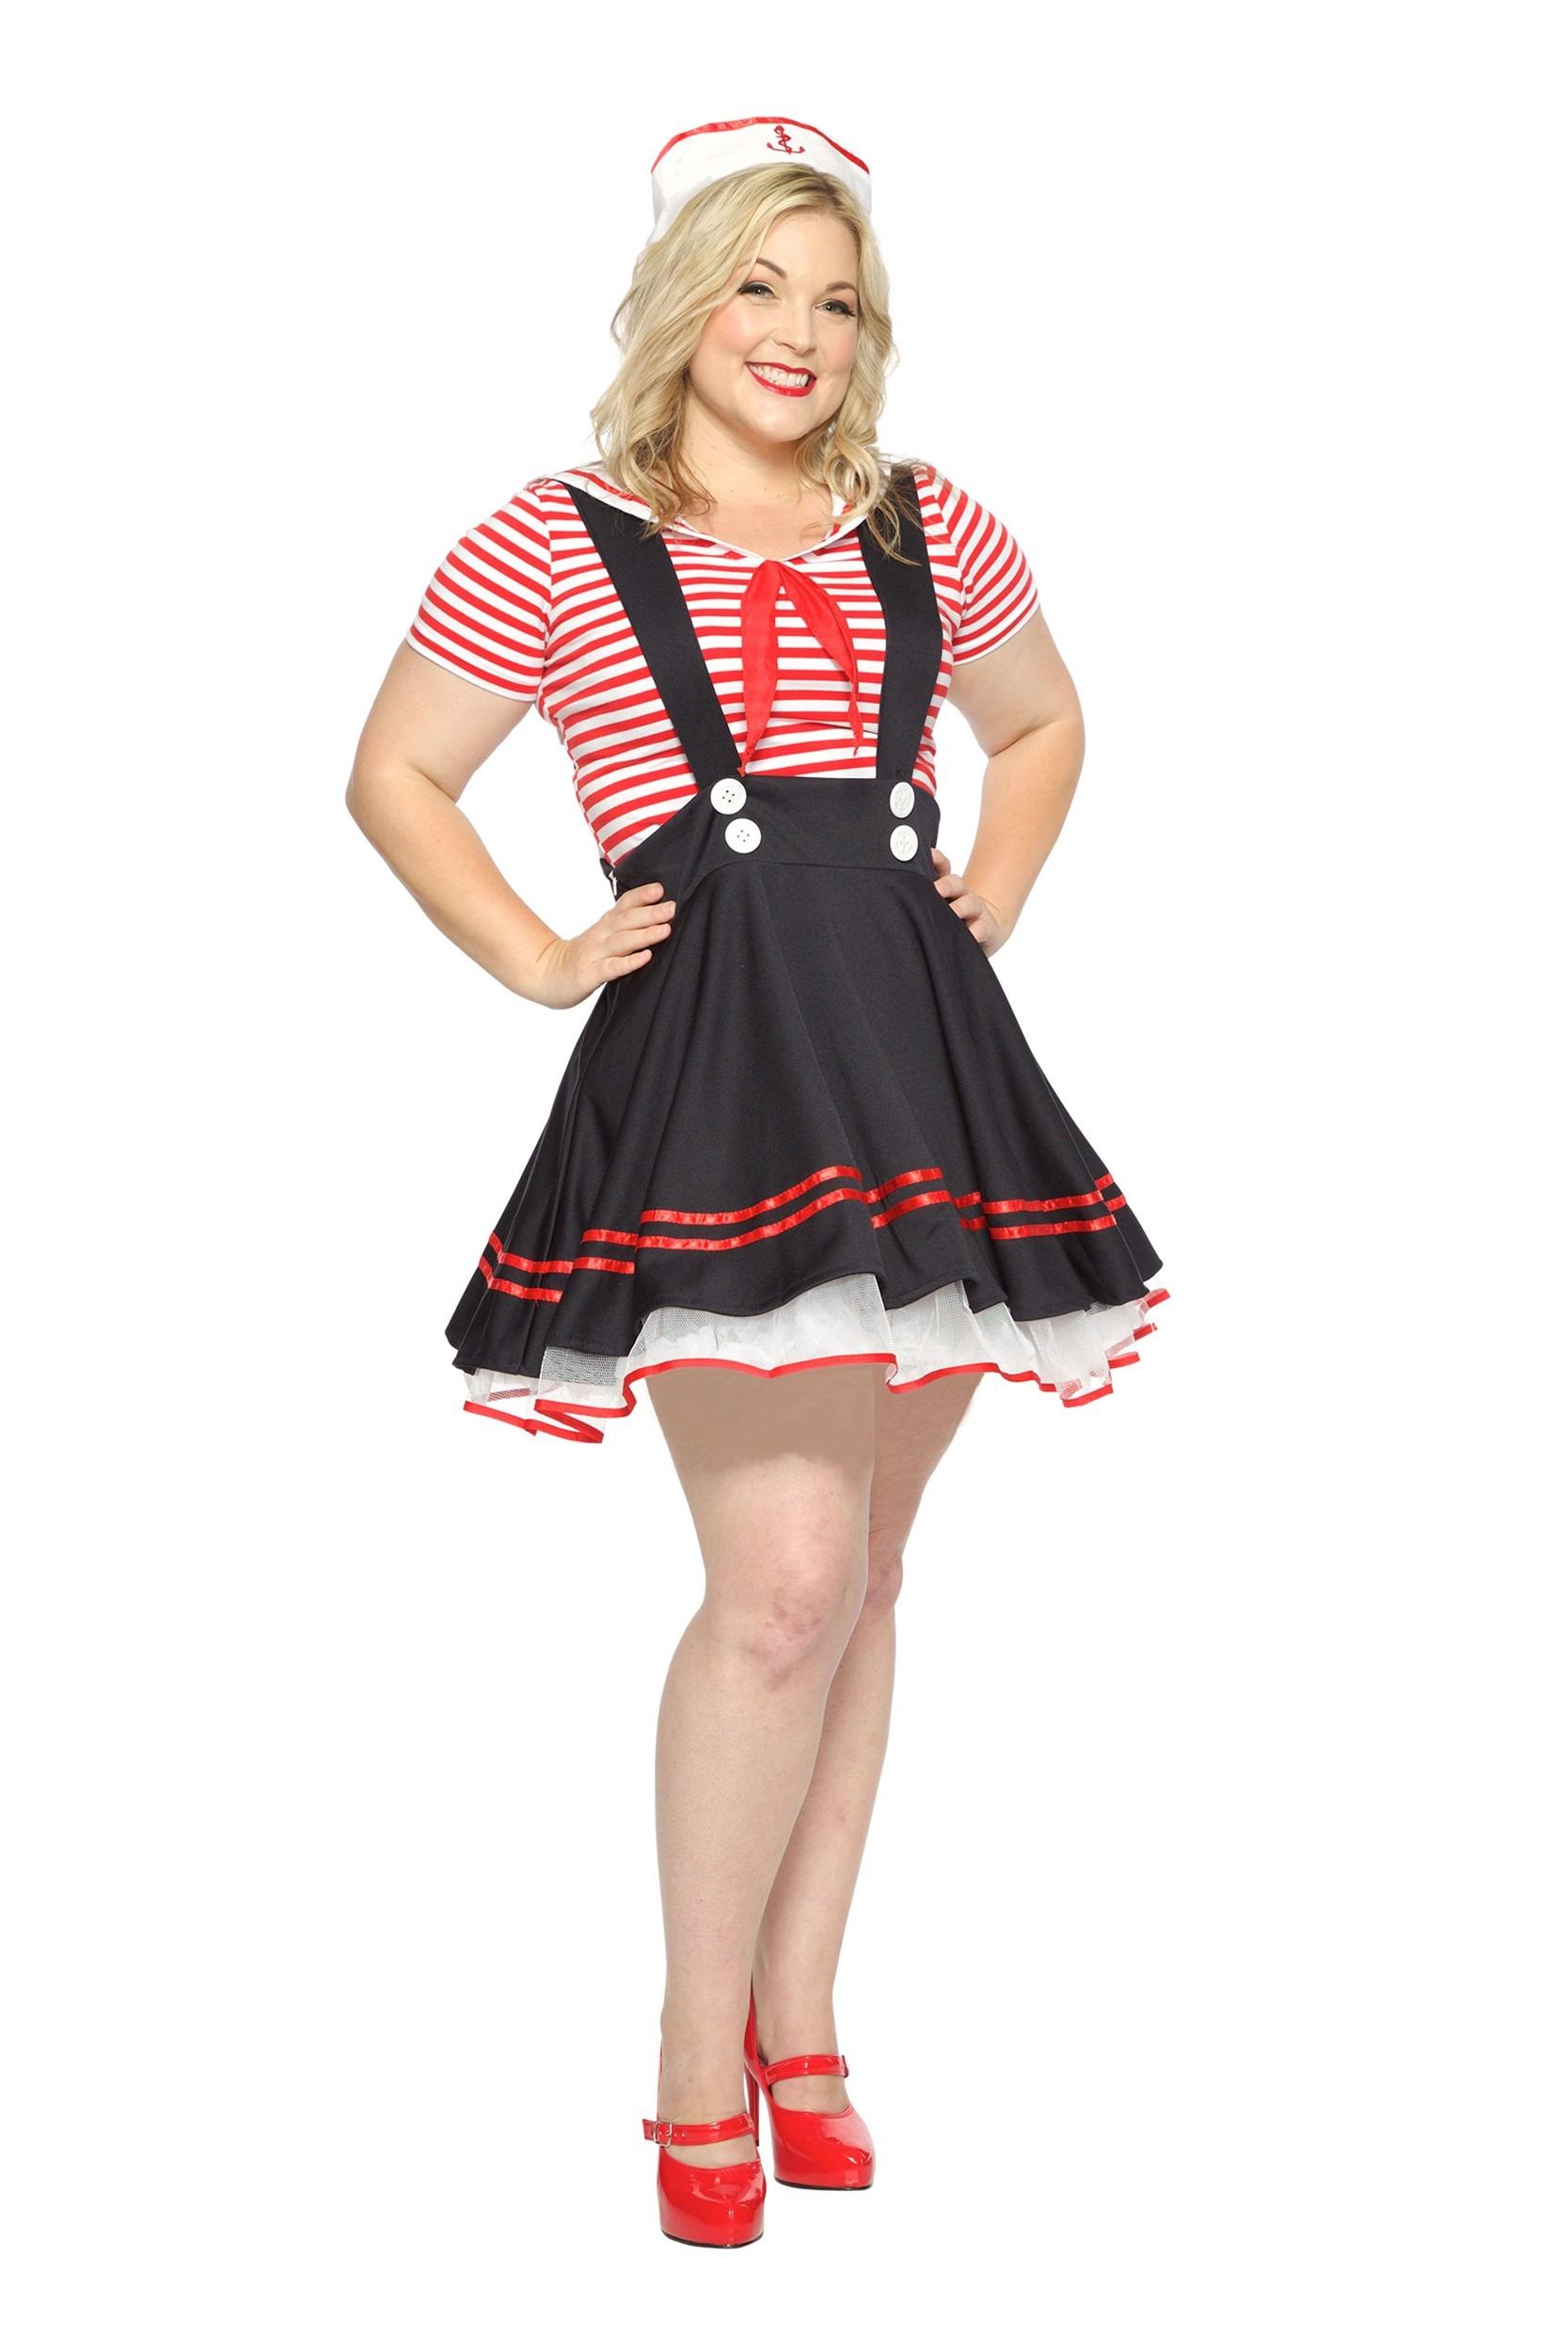 Womens Sailor Costumes & Pin Up Captain - HalloweenCostumes.com